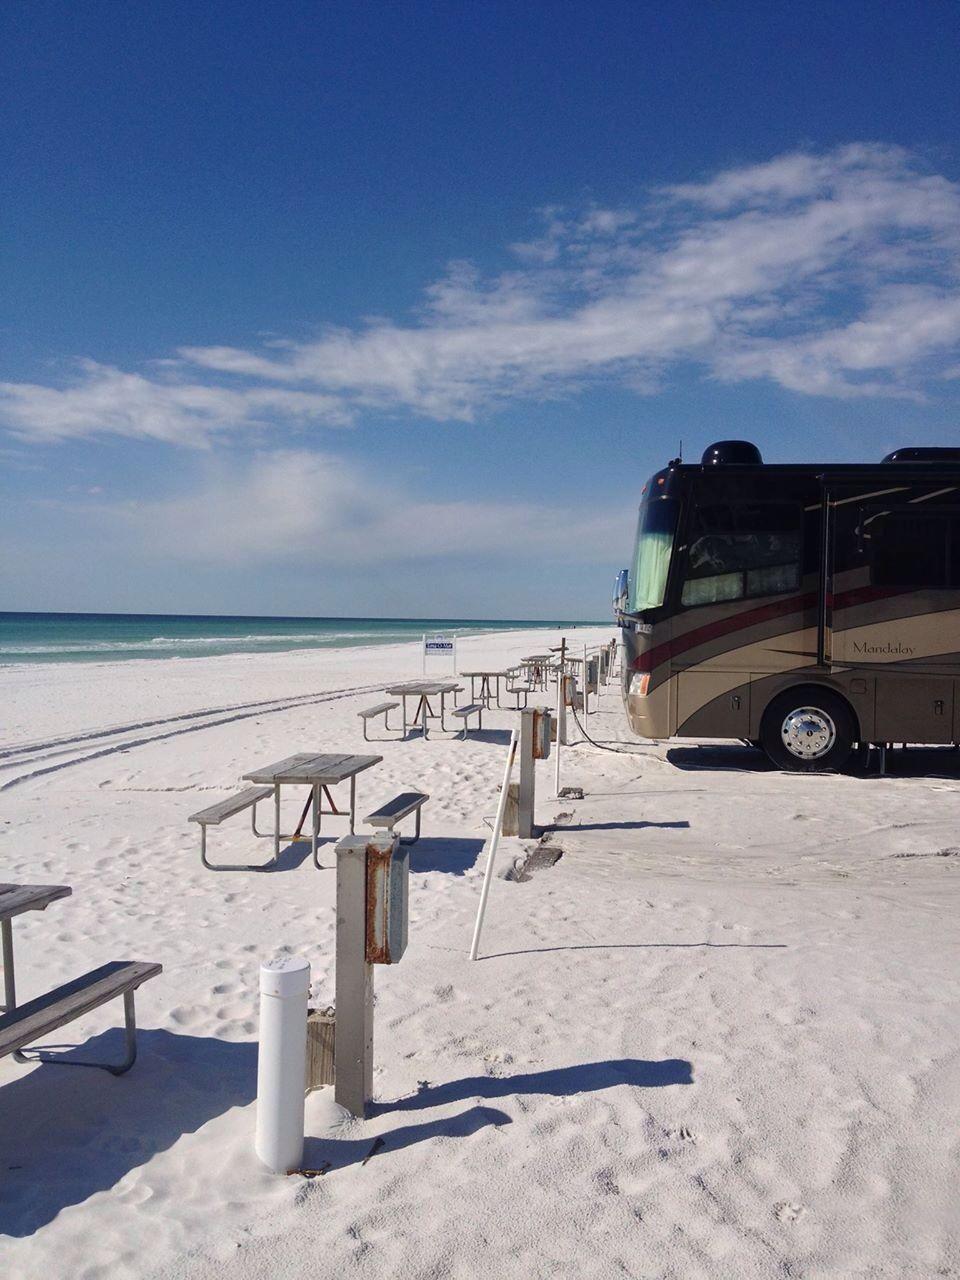 Camp Gulf Destin Fl Rv Vacation Camping Destinations Go Camping